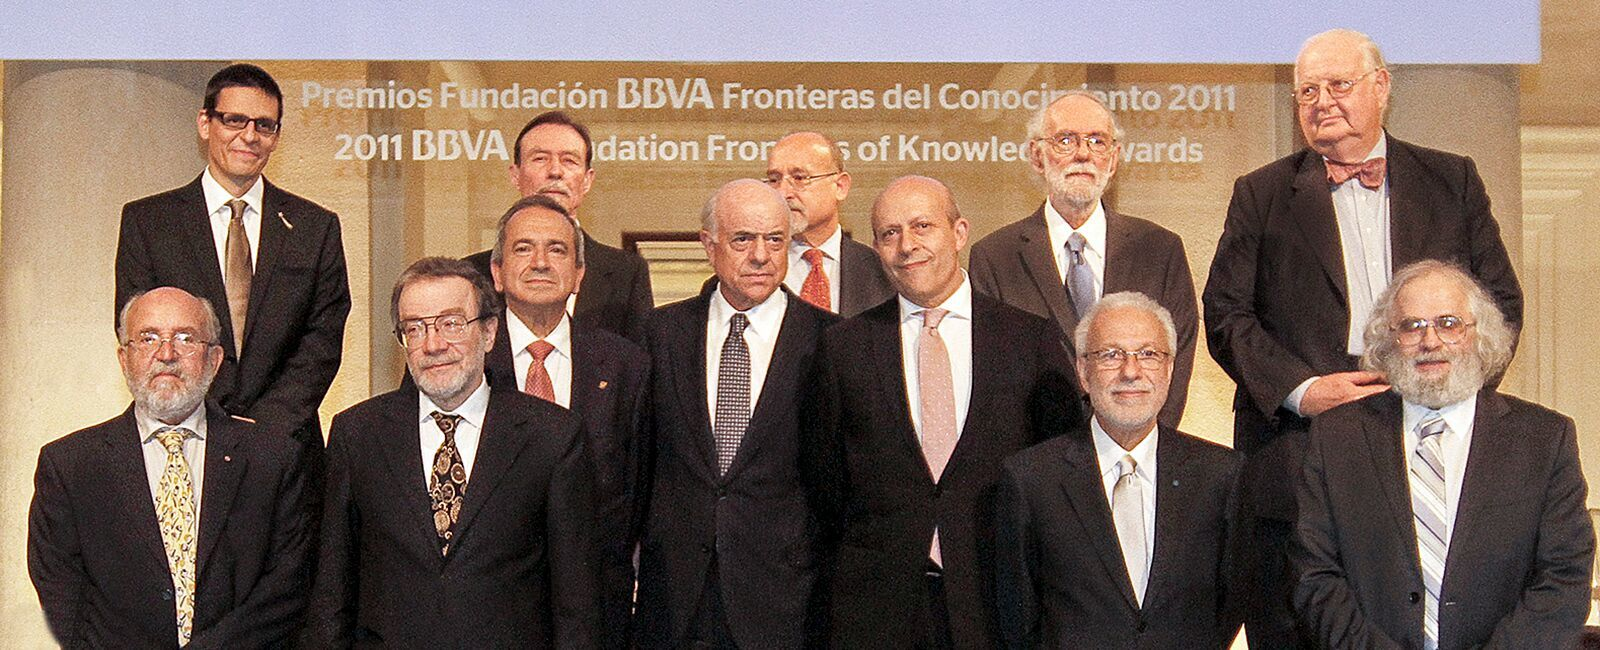 FBBVA-Fronteras-ceremonia-2011-ok